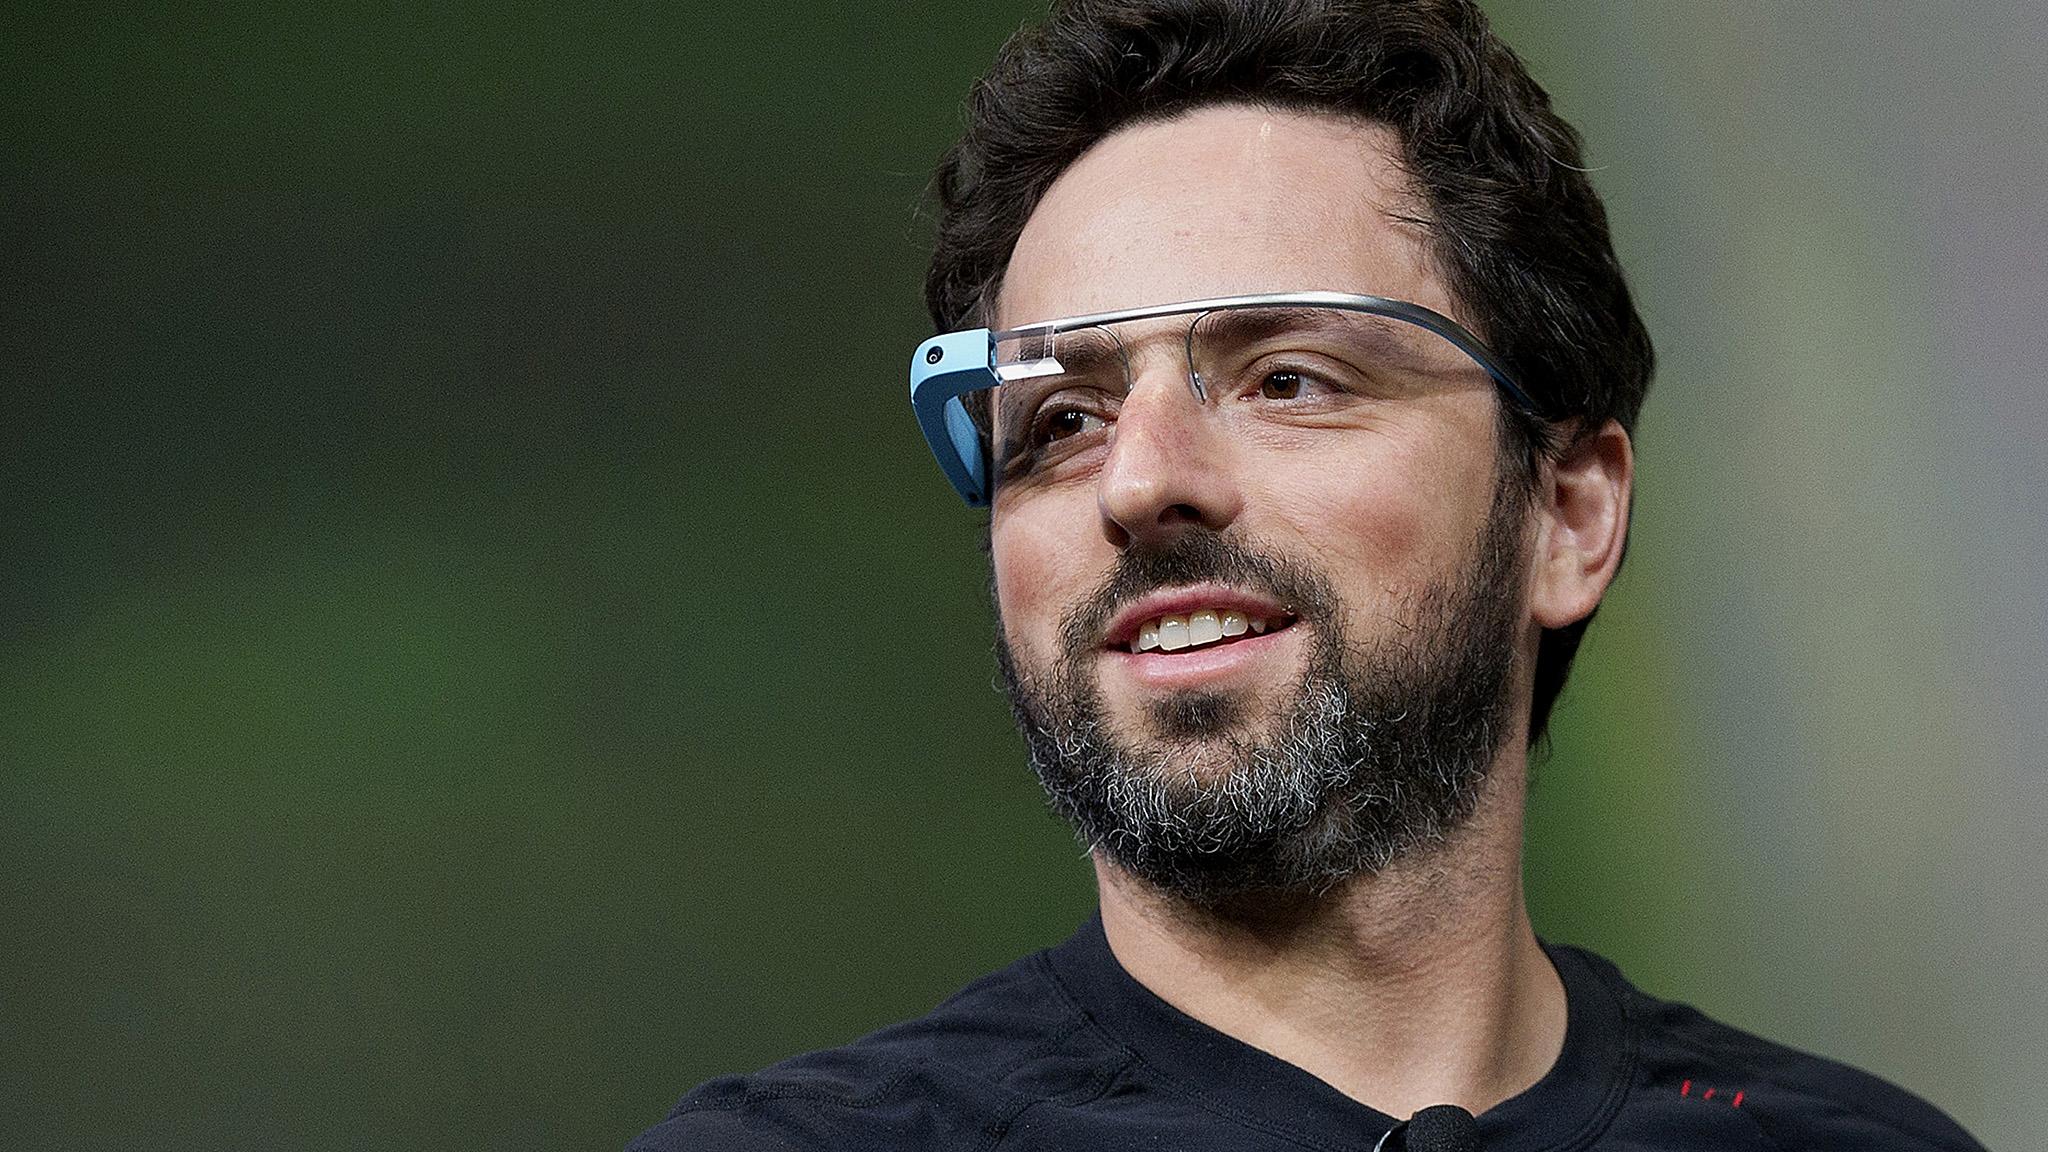 سرگئی برین - Sergey Brin